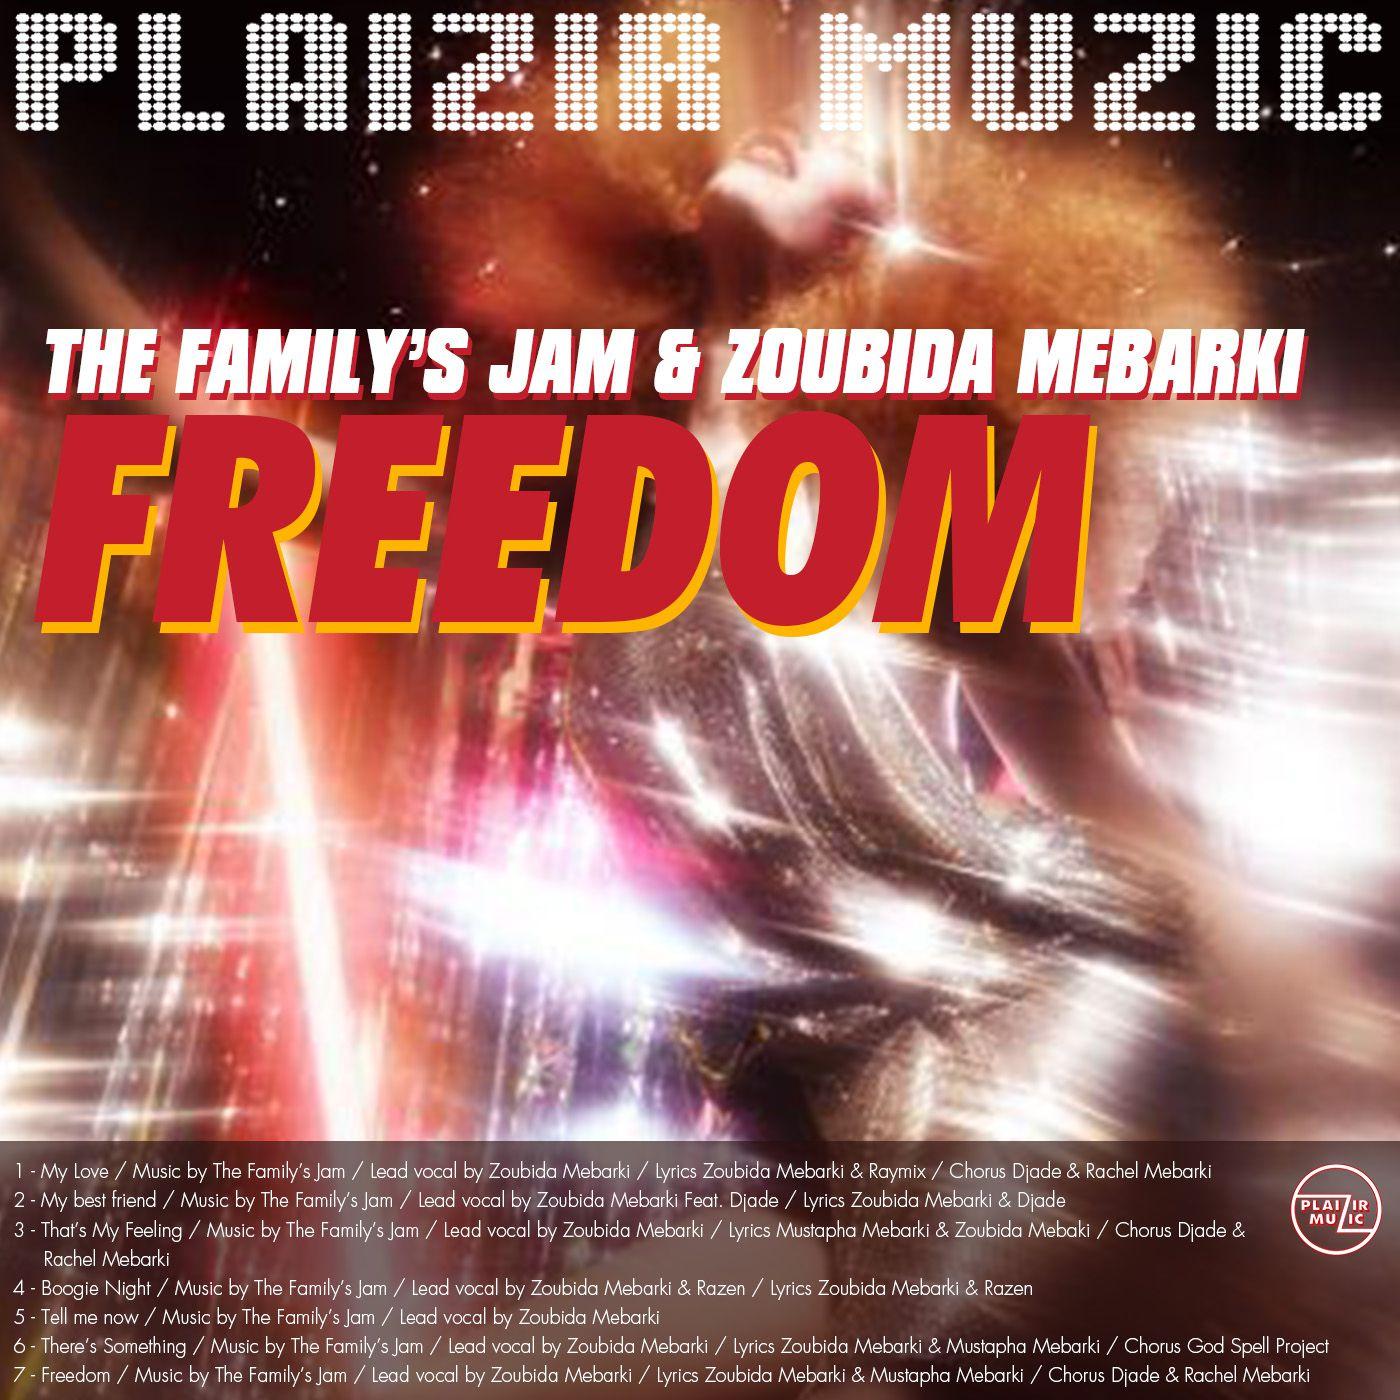 Un petit goût de Liberté pour The Family's Jam & Zoubida Mebarki